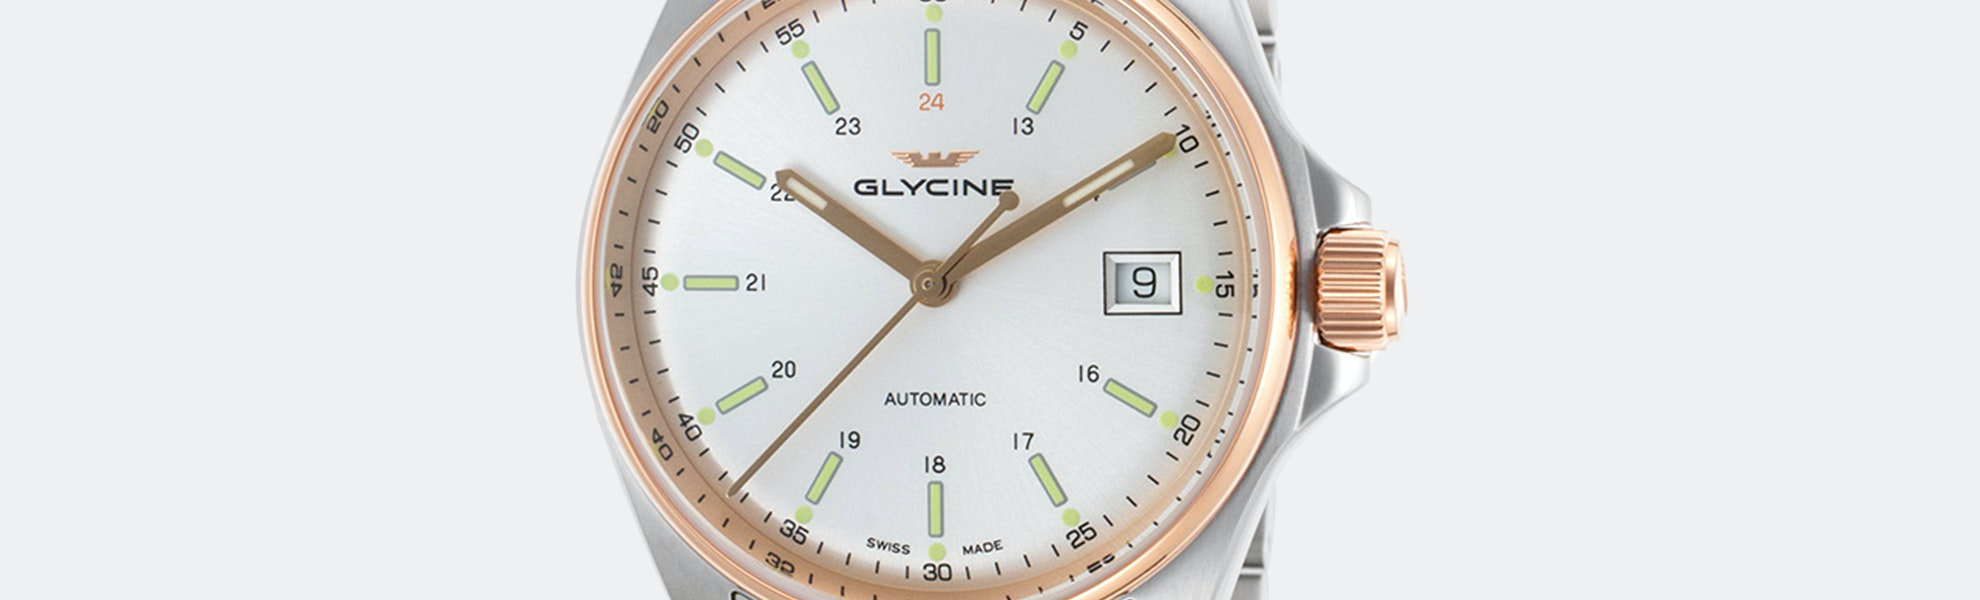 Glycine Combat 6 36mm Automatic Watch